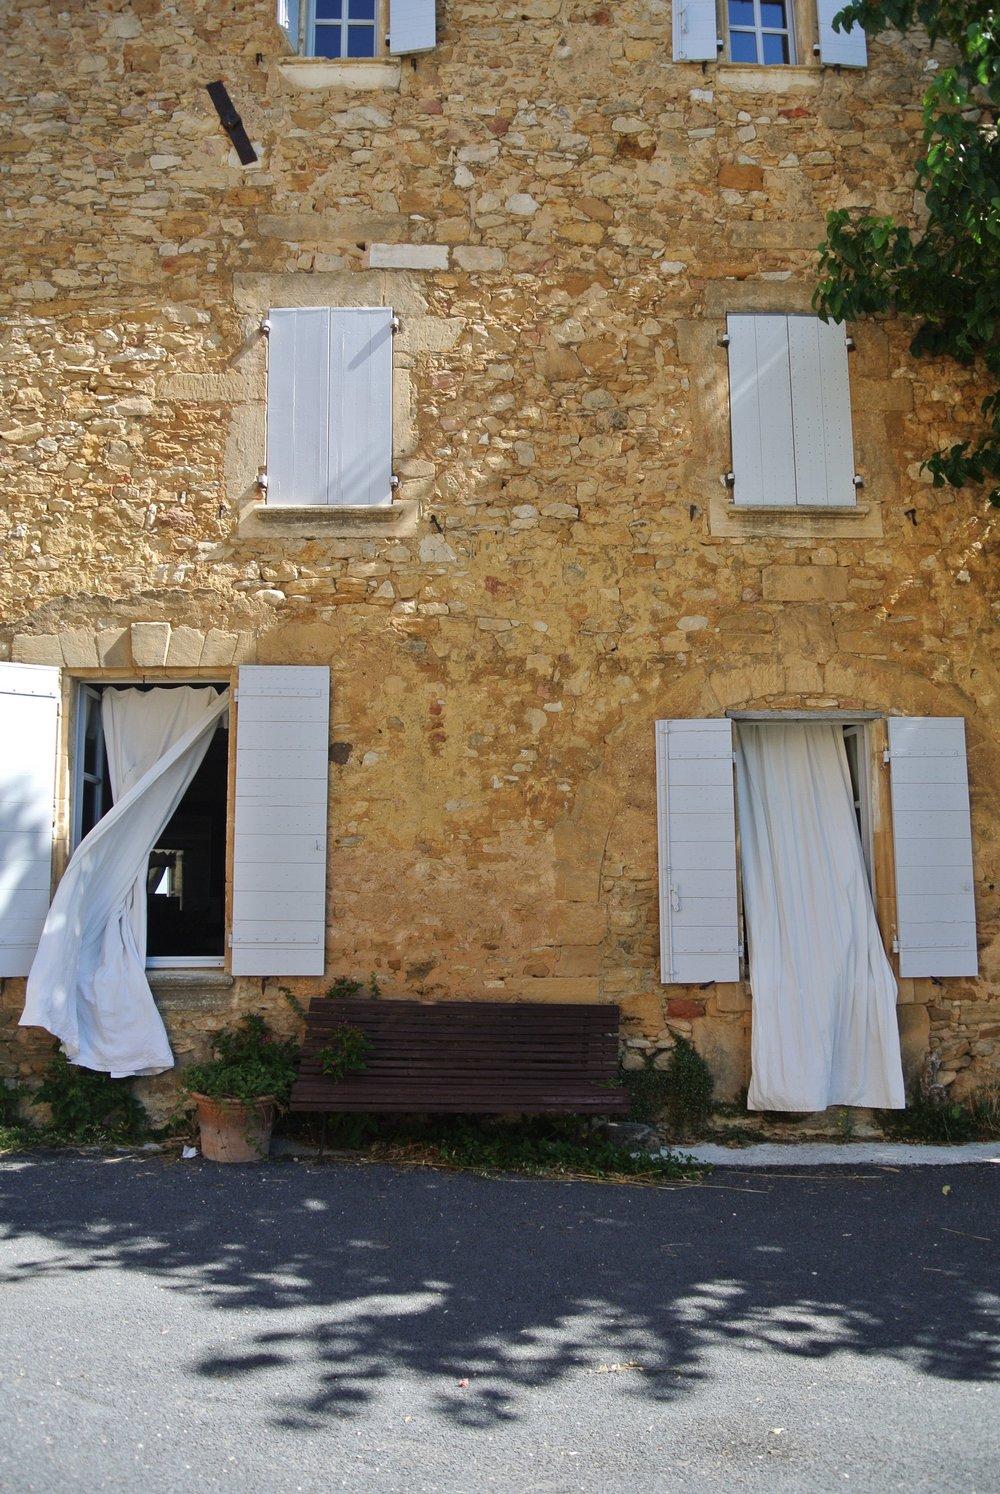 Les Sardines Provence7D18E720-31C3-468B-8248-FD801BBBF1CD.JPG